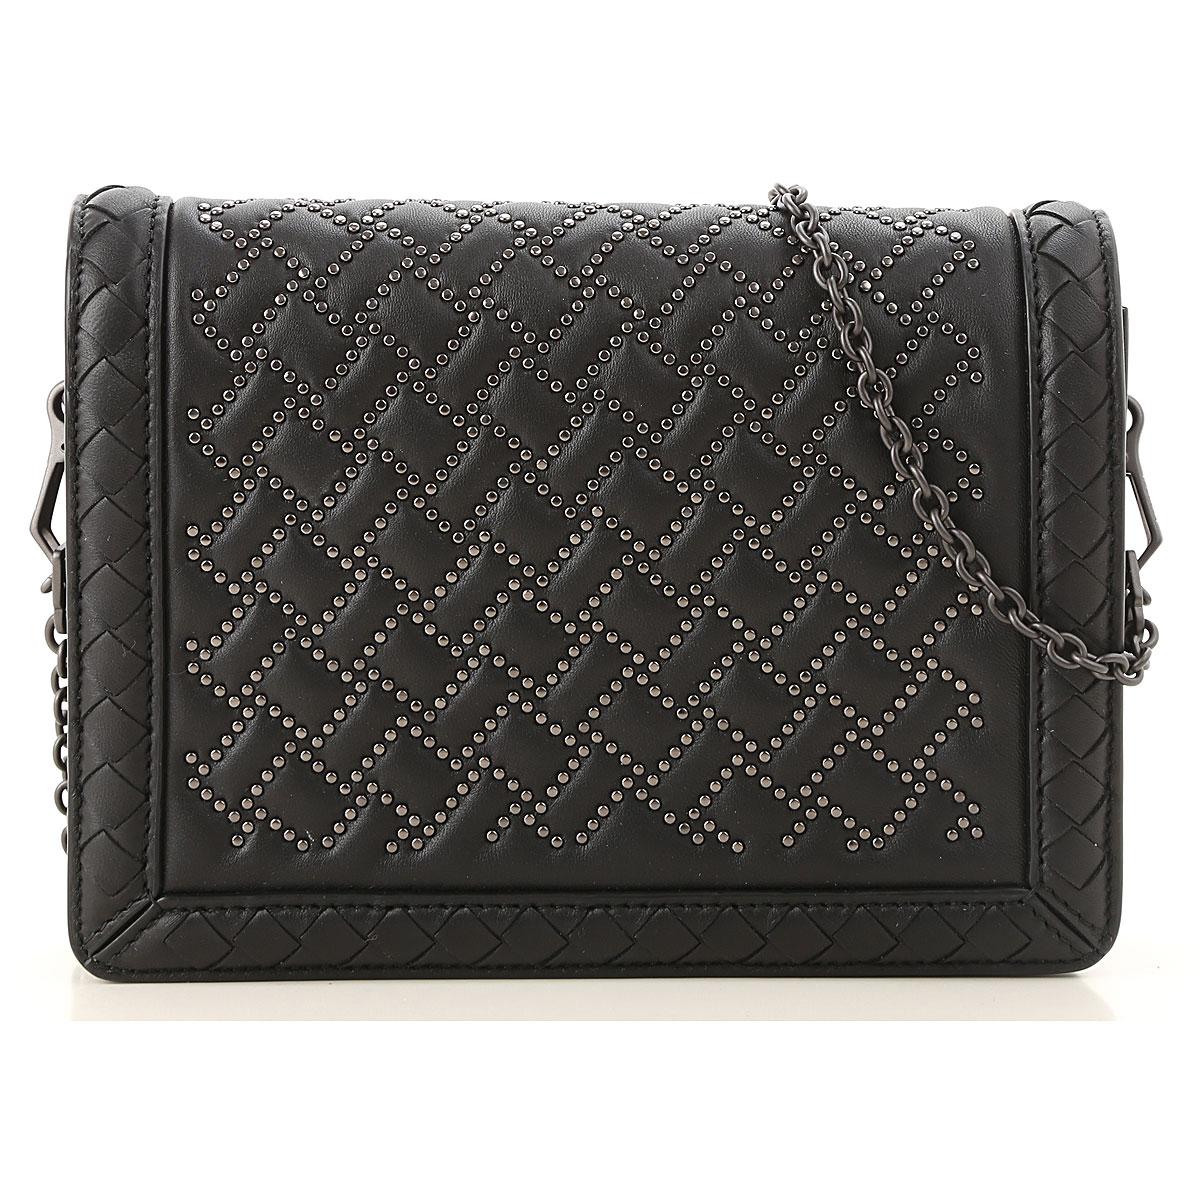 Bottega Veneta Shoulder Bag for Women, Black, Leather, 2019